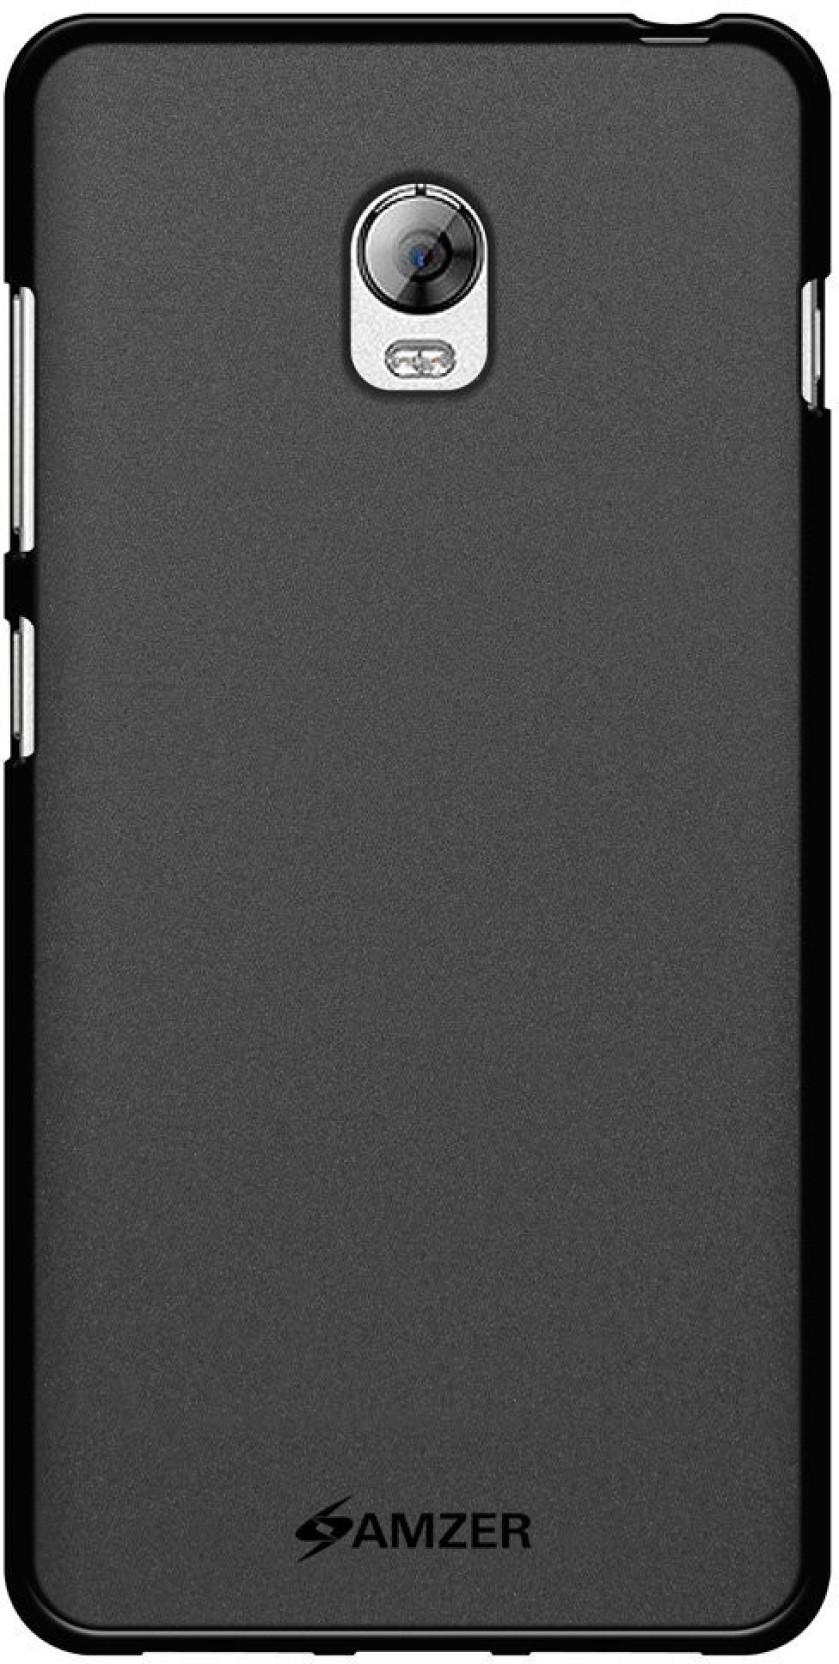 competitive price 5f001 13889 Amzer Back Cover for Lenovo VIBE P1, Lenovo Vibe P1 Turbo